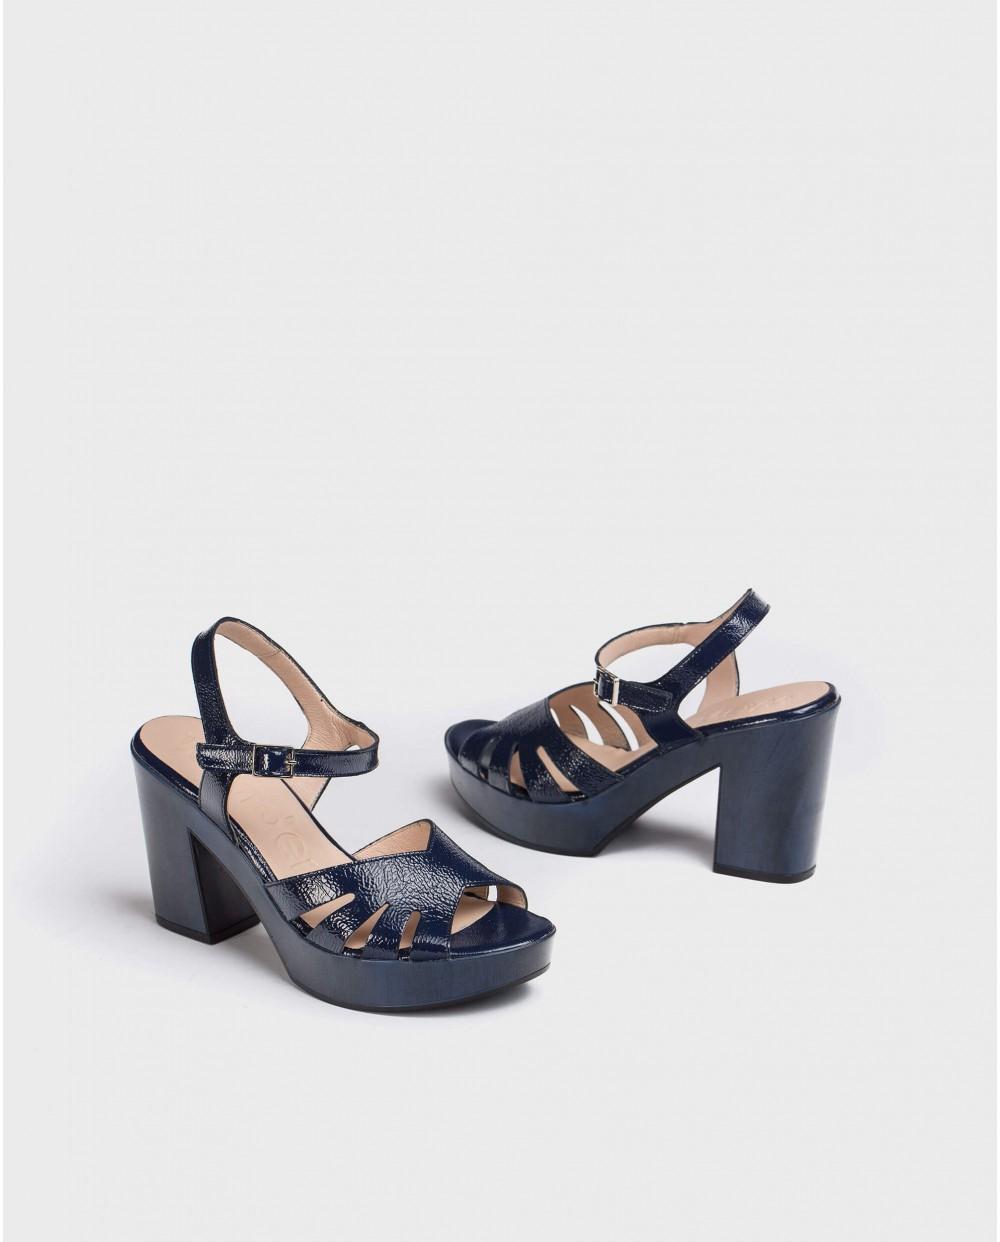 Wonders-Heels-Sandal with side cut out detail